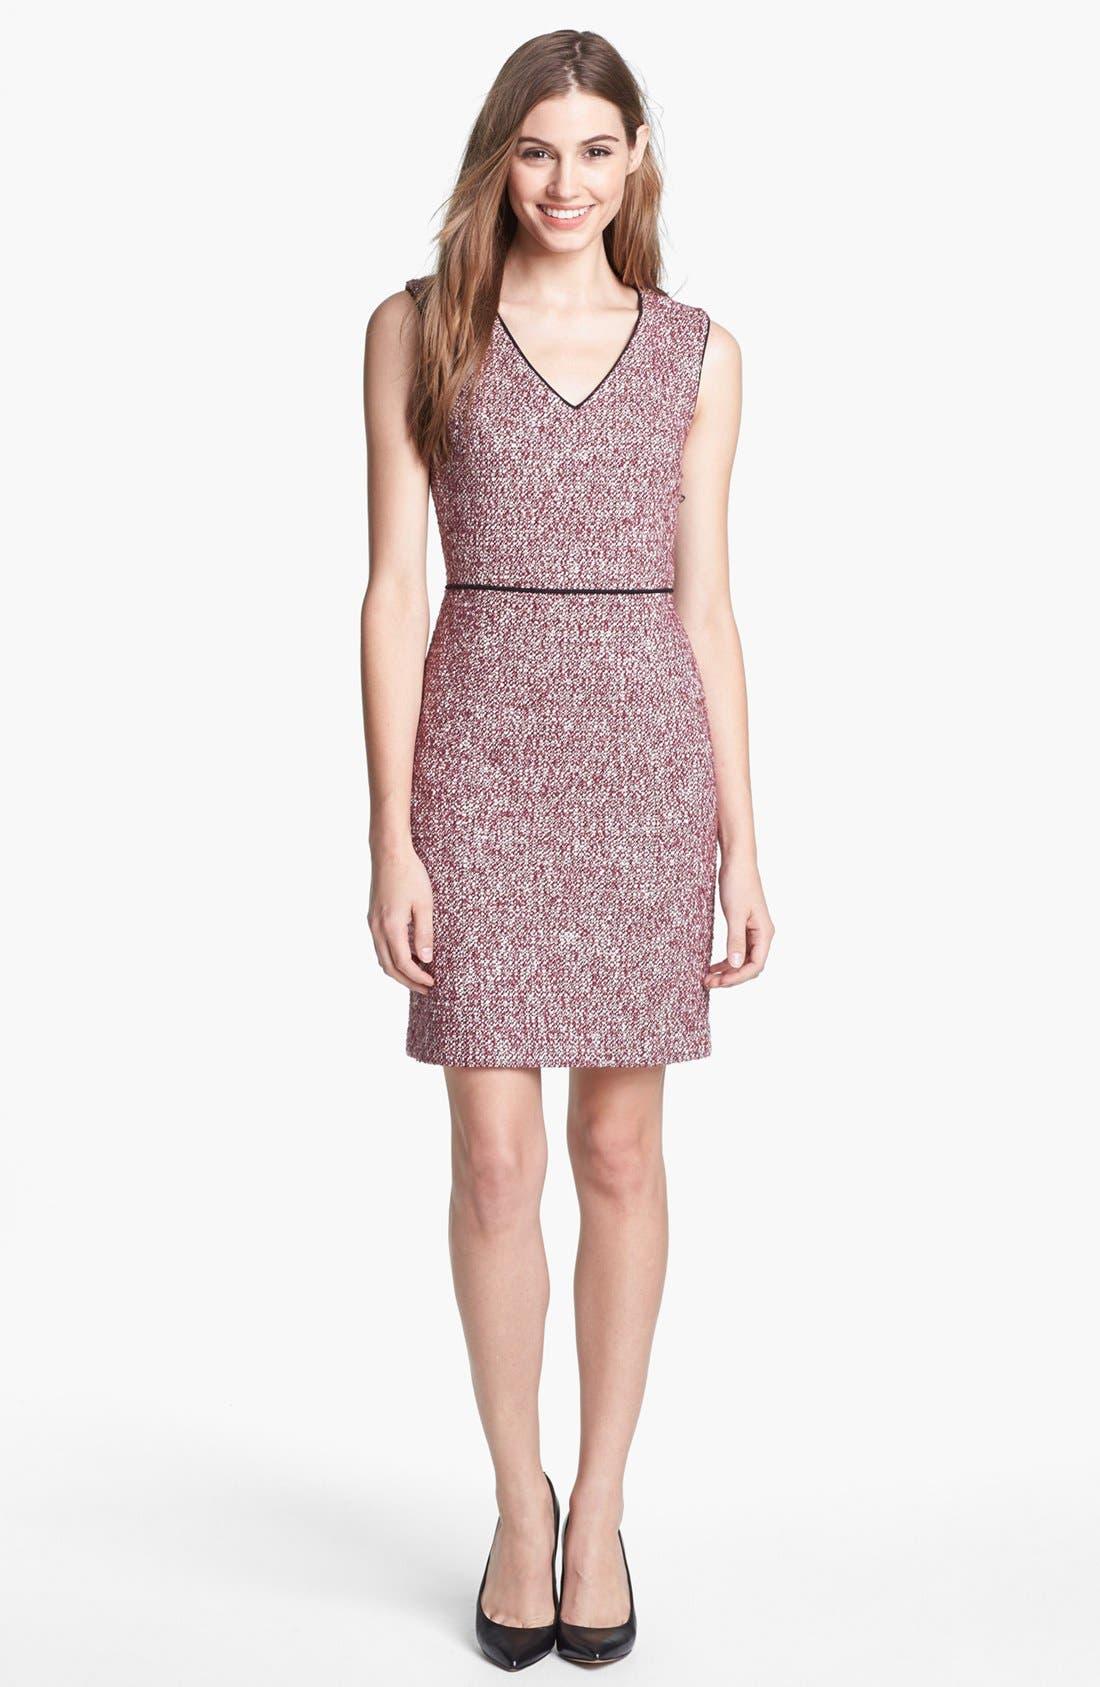 Main Image - 4.collective V-Neck Sheath Dress